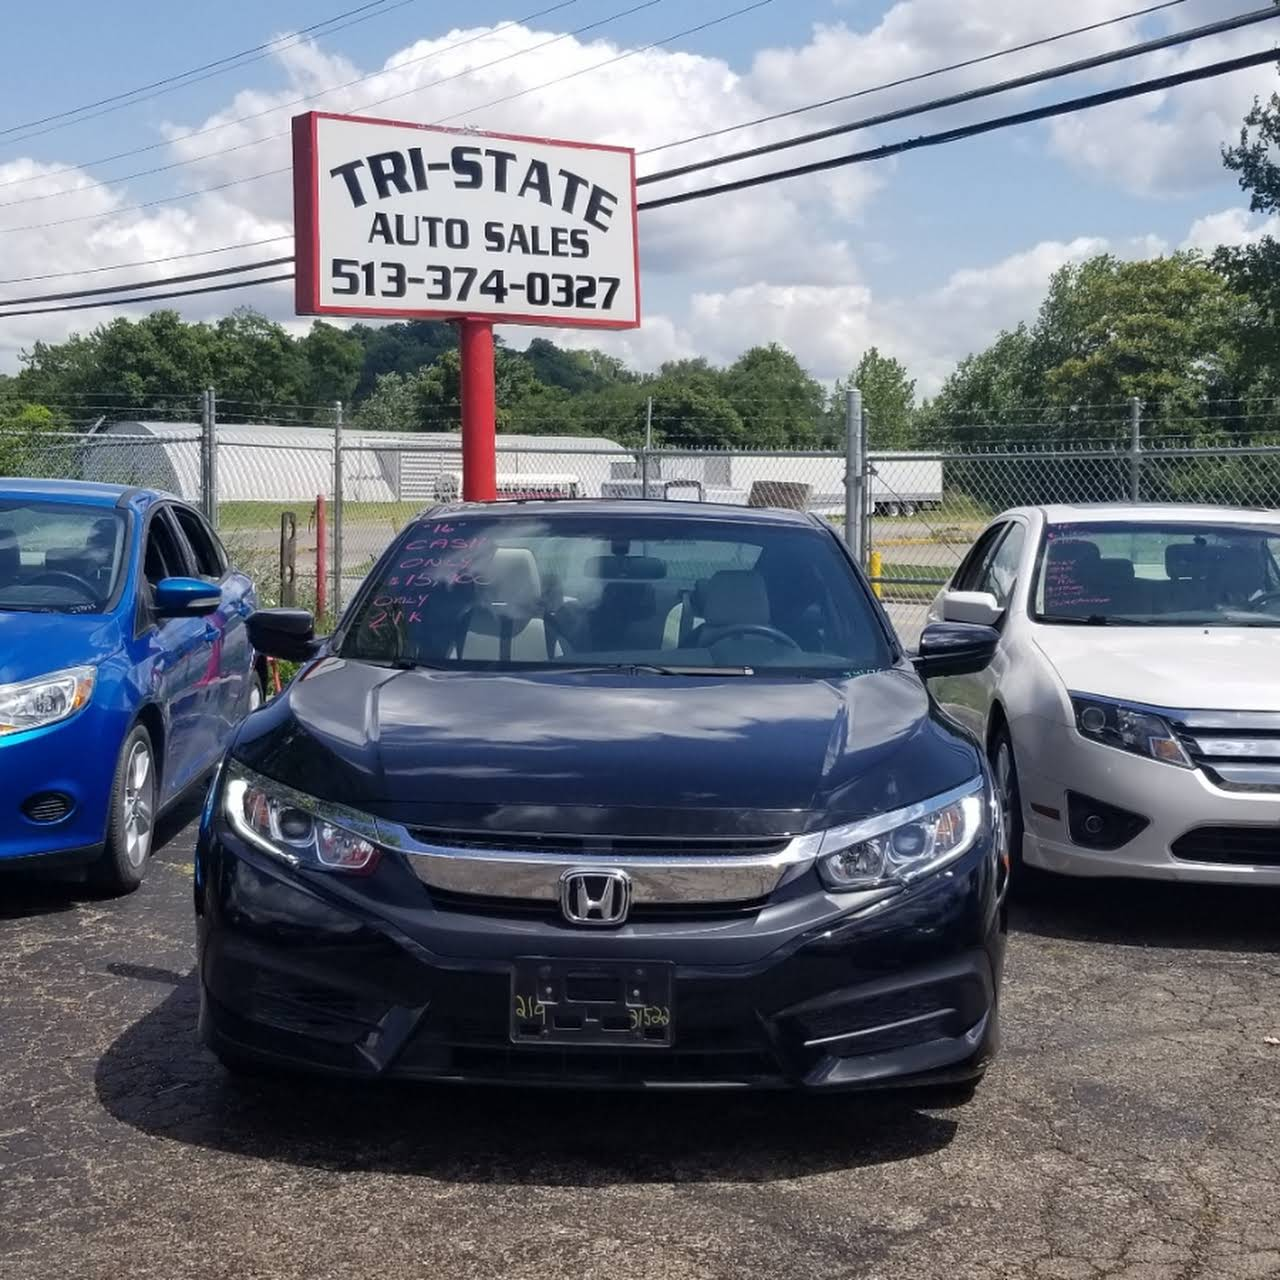 Tri State Auto Sales >> Tri-State Auto Sales - Used Car Dealer in Cincinnati But